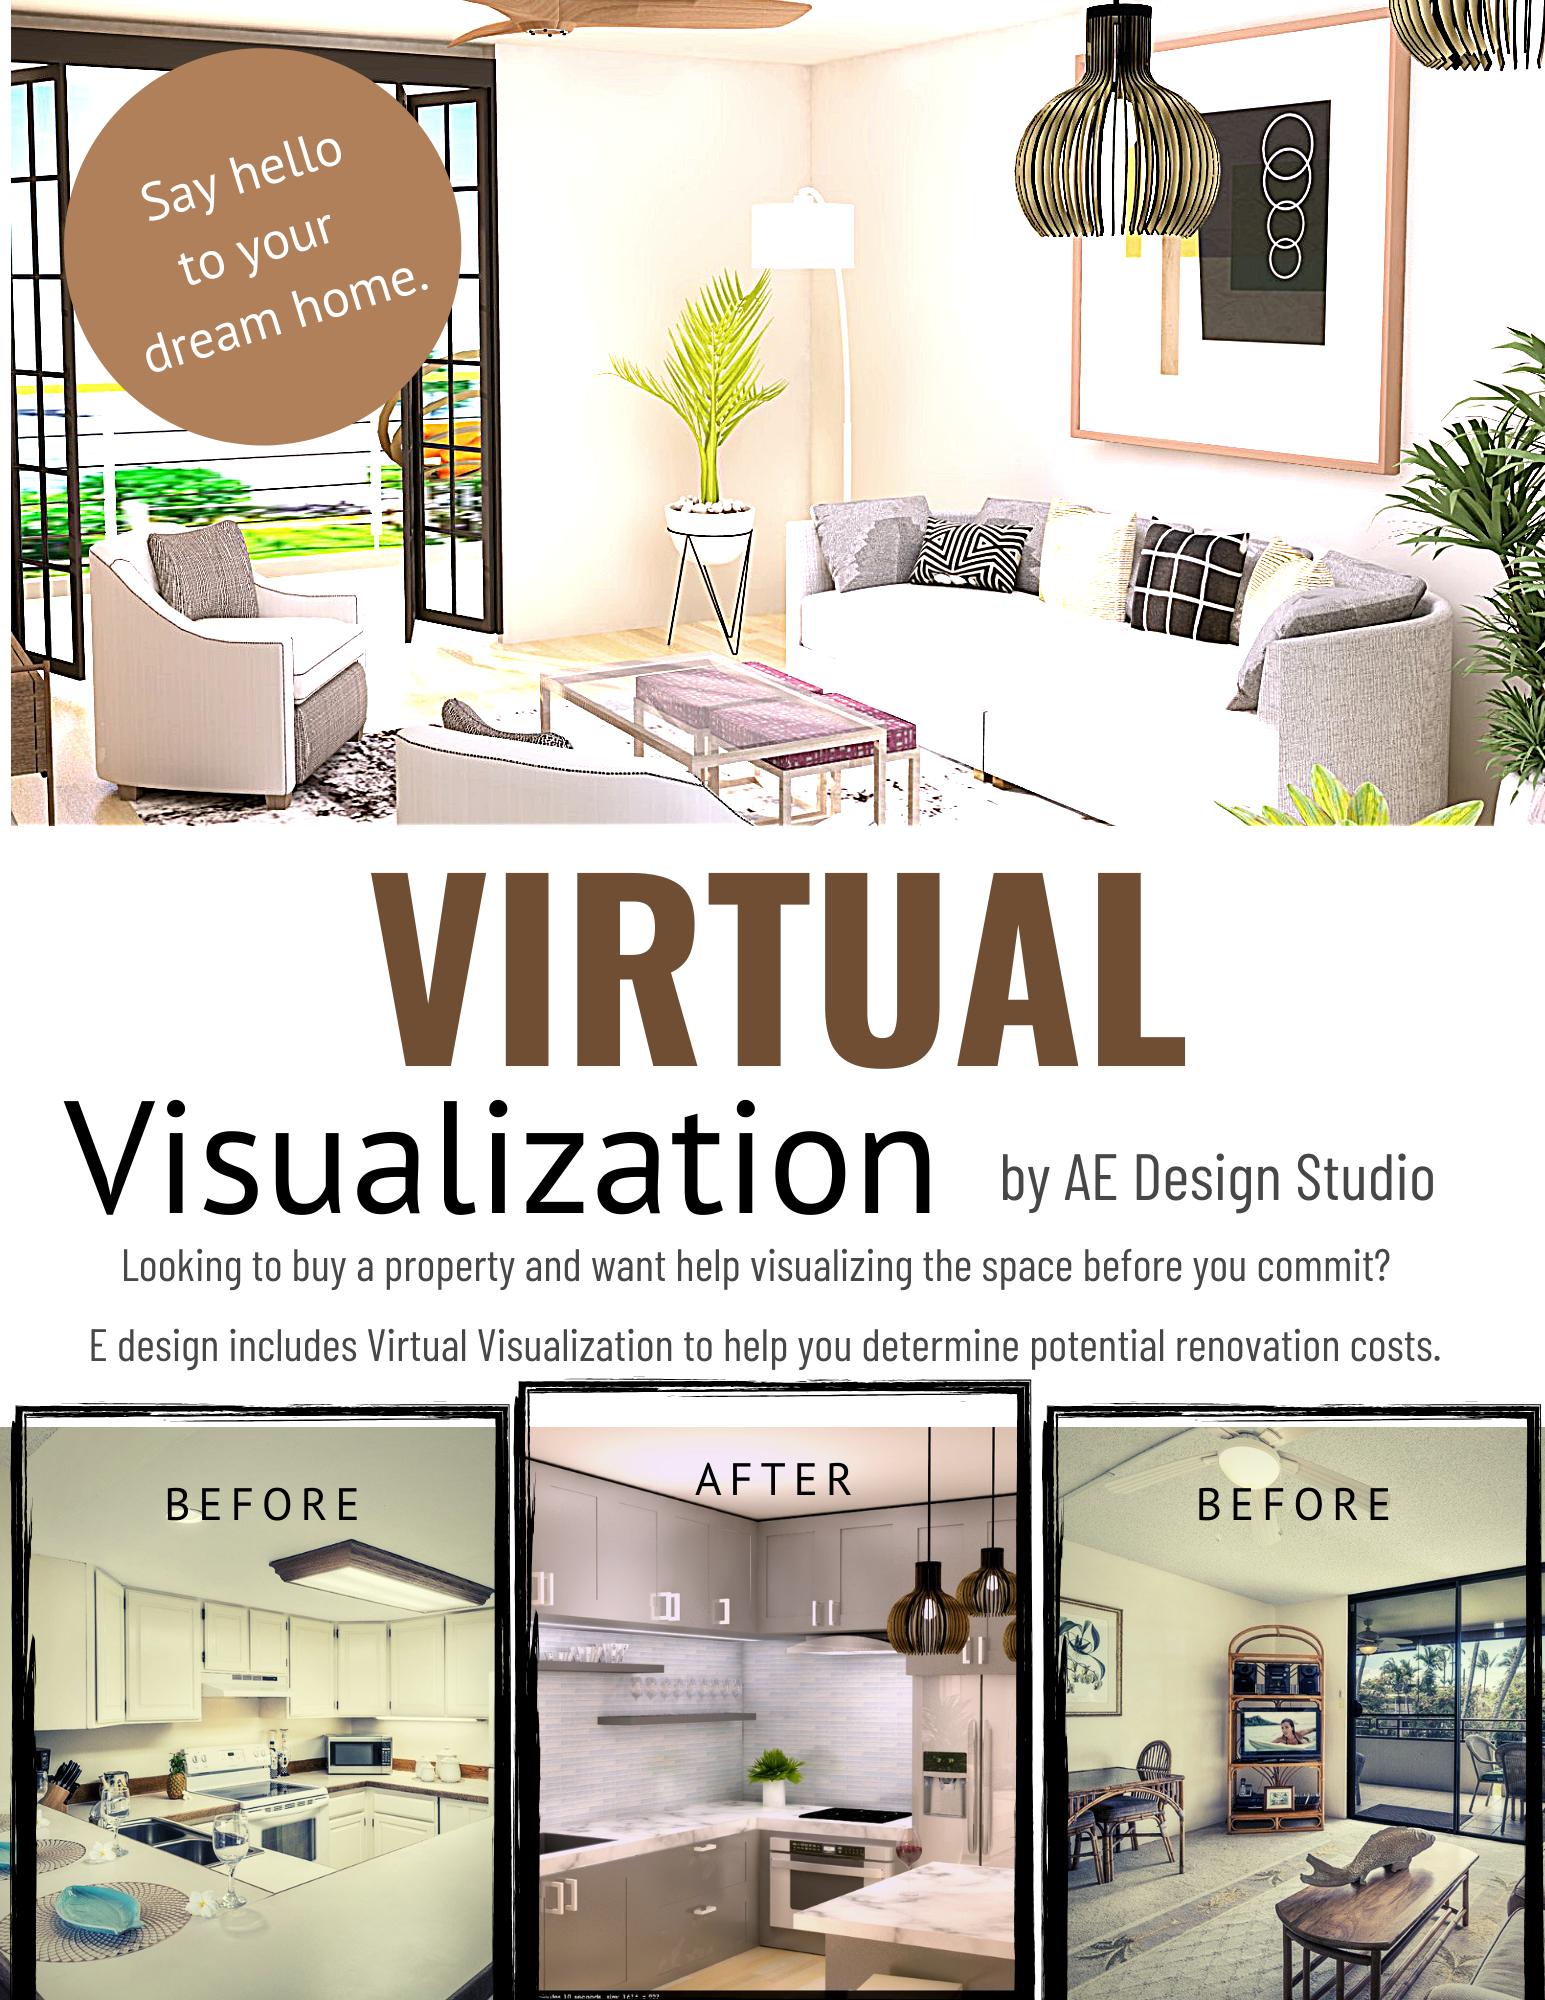 Virtual Visualization For Buying Homes Online Interior Design Services Edesign Online Interior Design